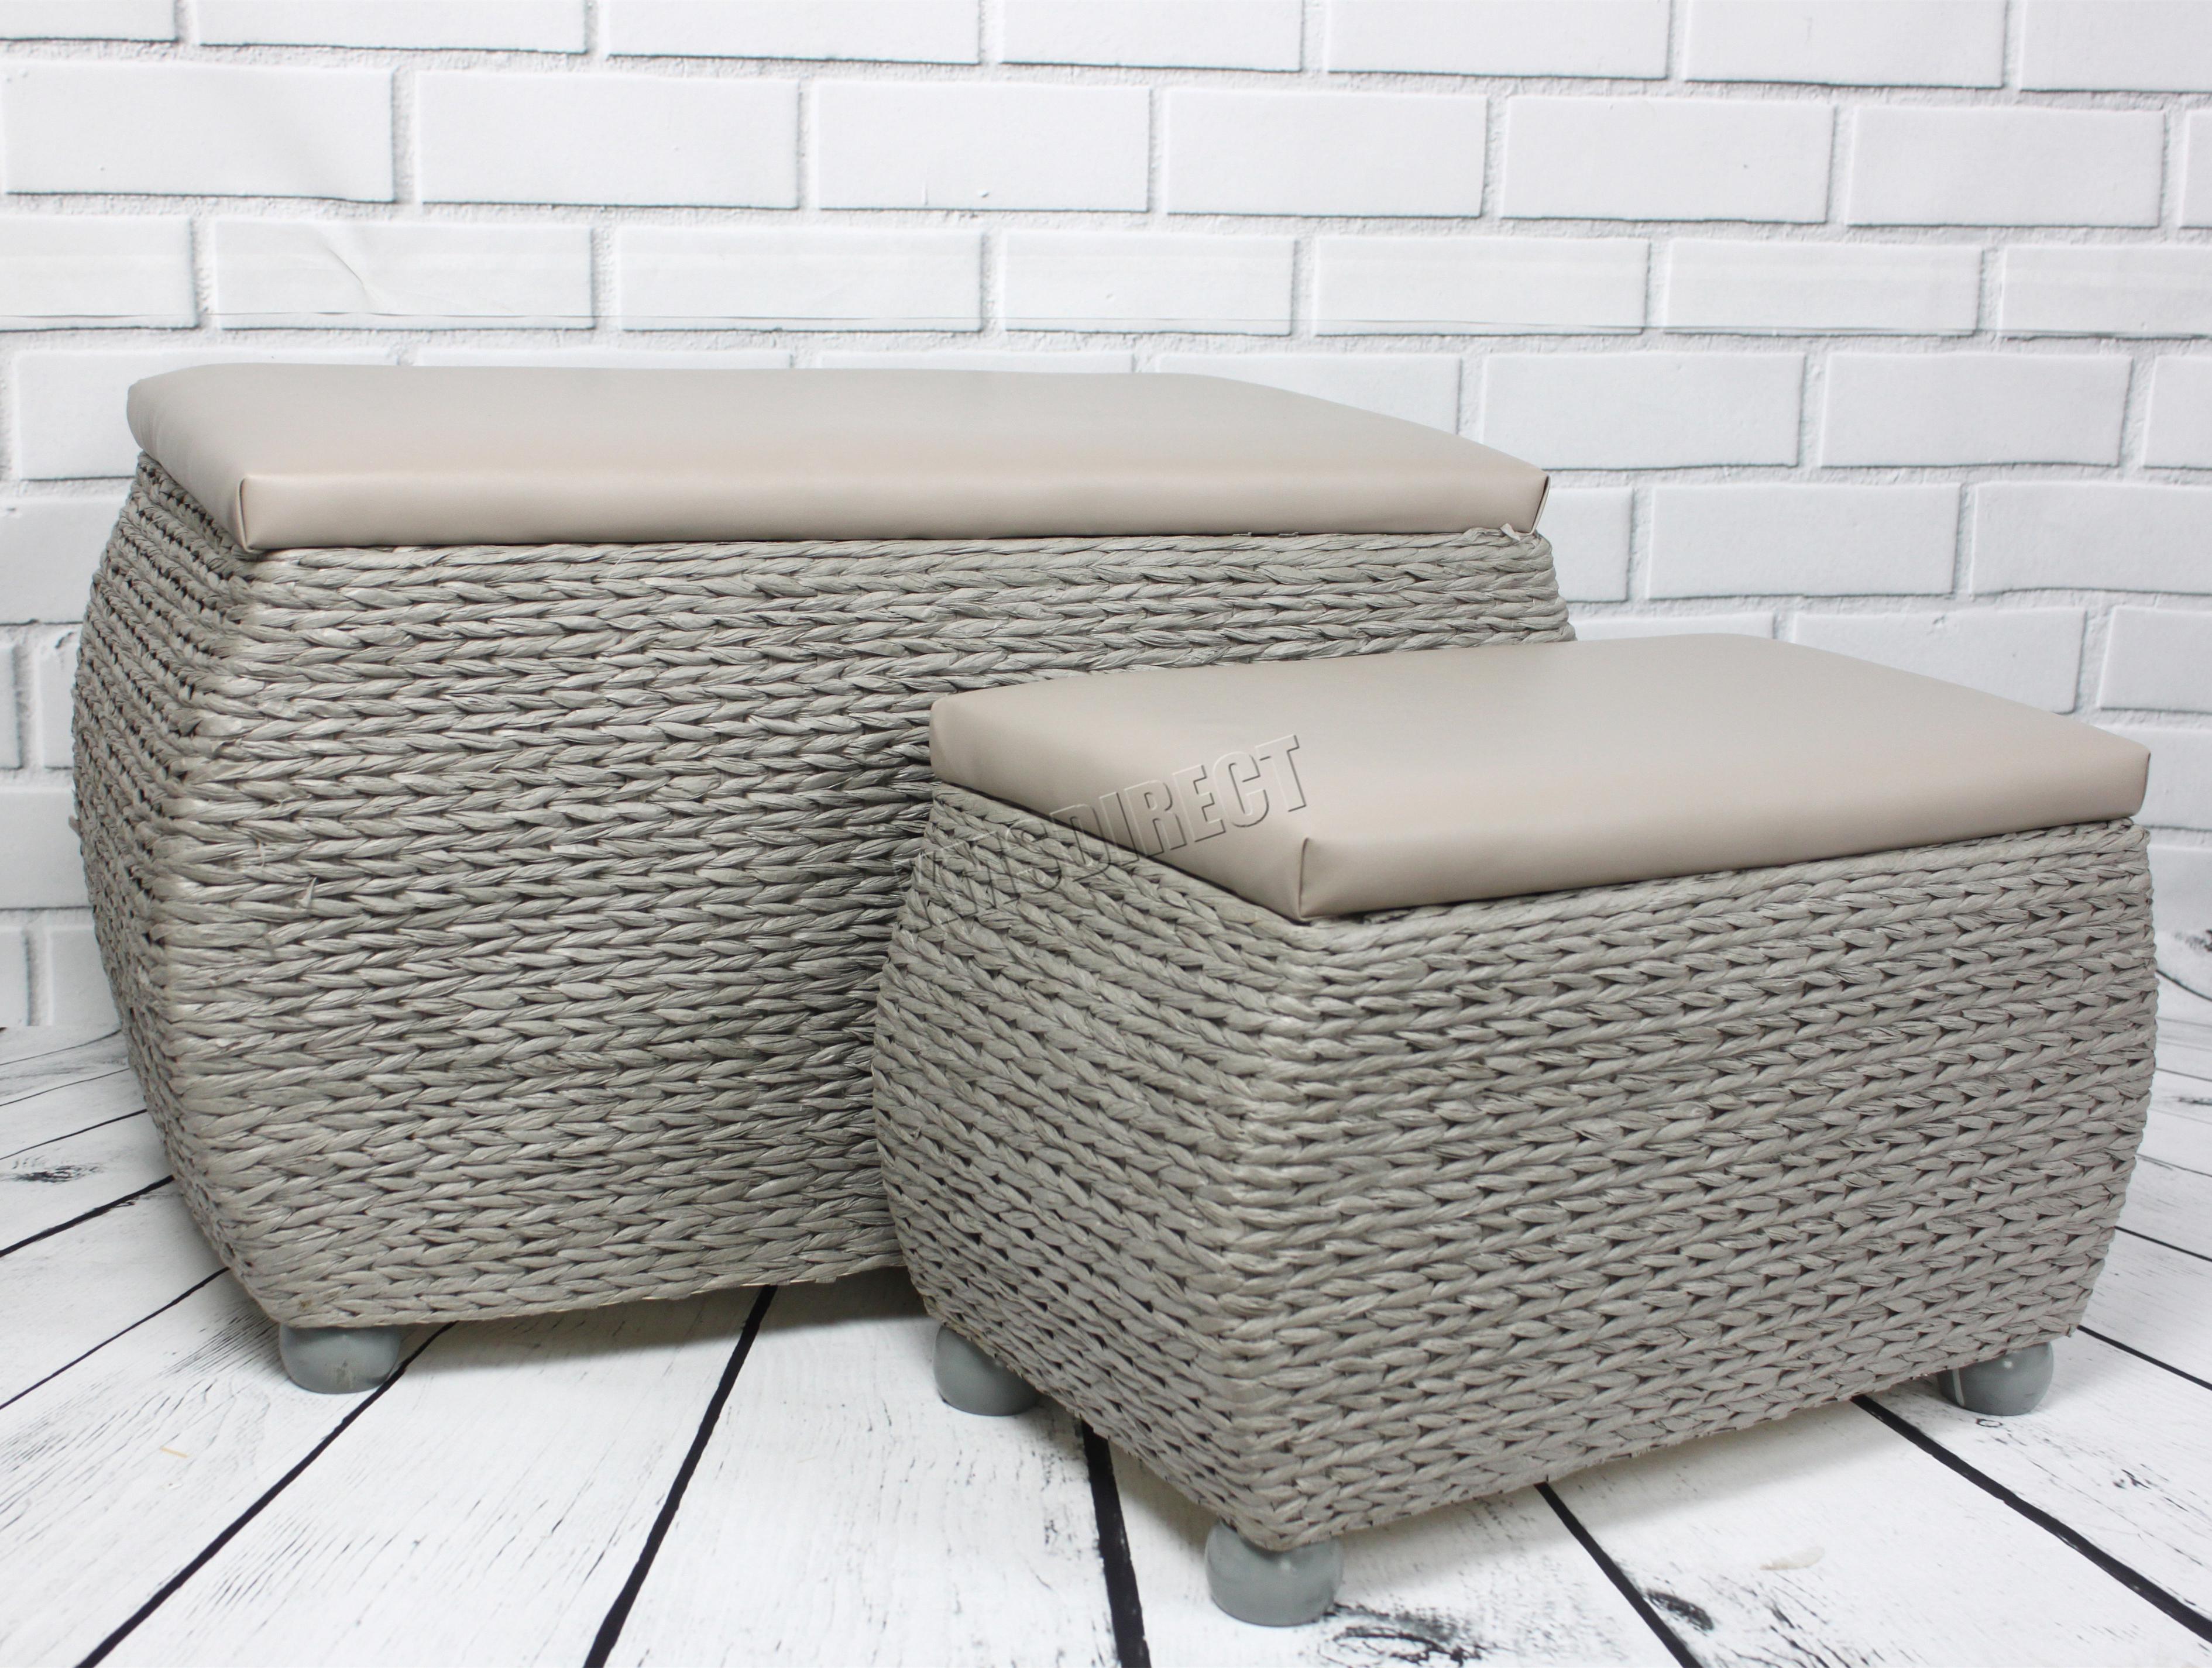 FoxHunter Pair Indoor Storage Bench Woven Twin Rattan Basket Box ...